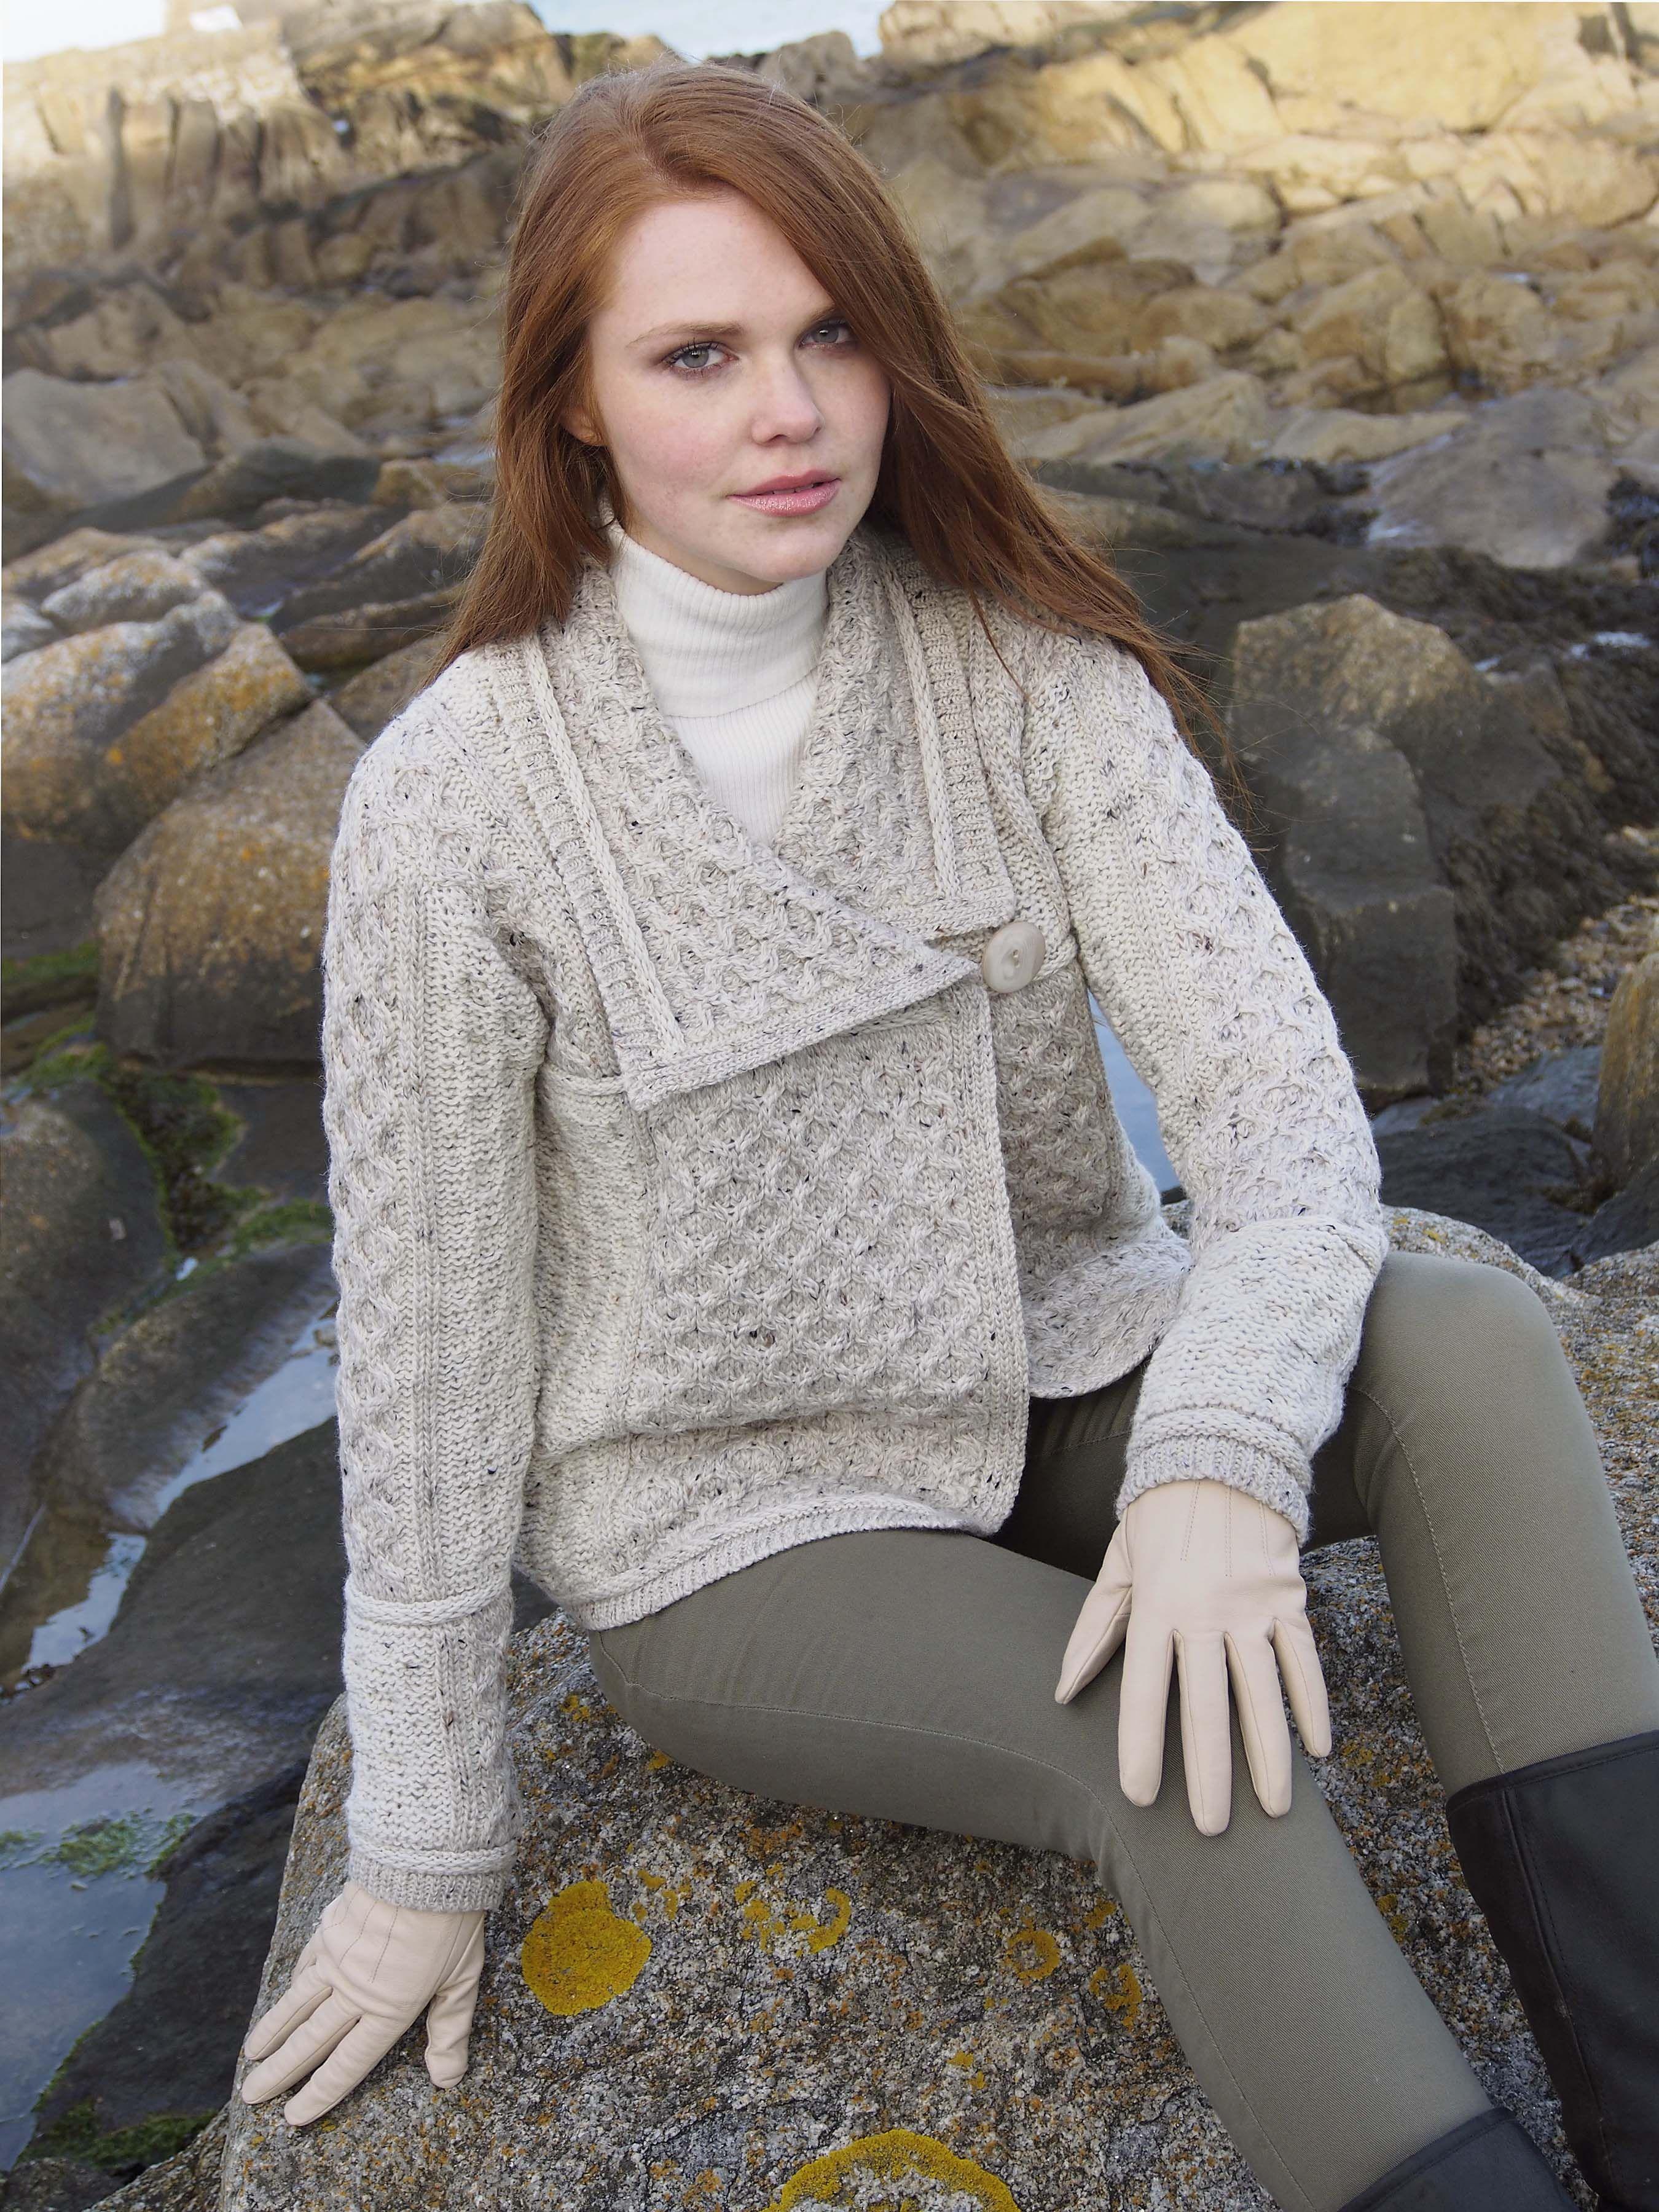 299089182dcd6f One Button Aran Cardigan by Natallia Kulikouskaya for West End Knitwear